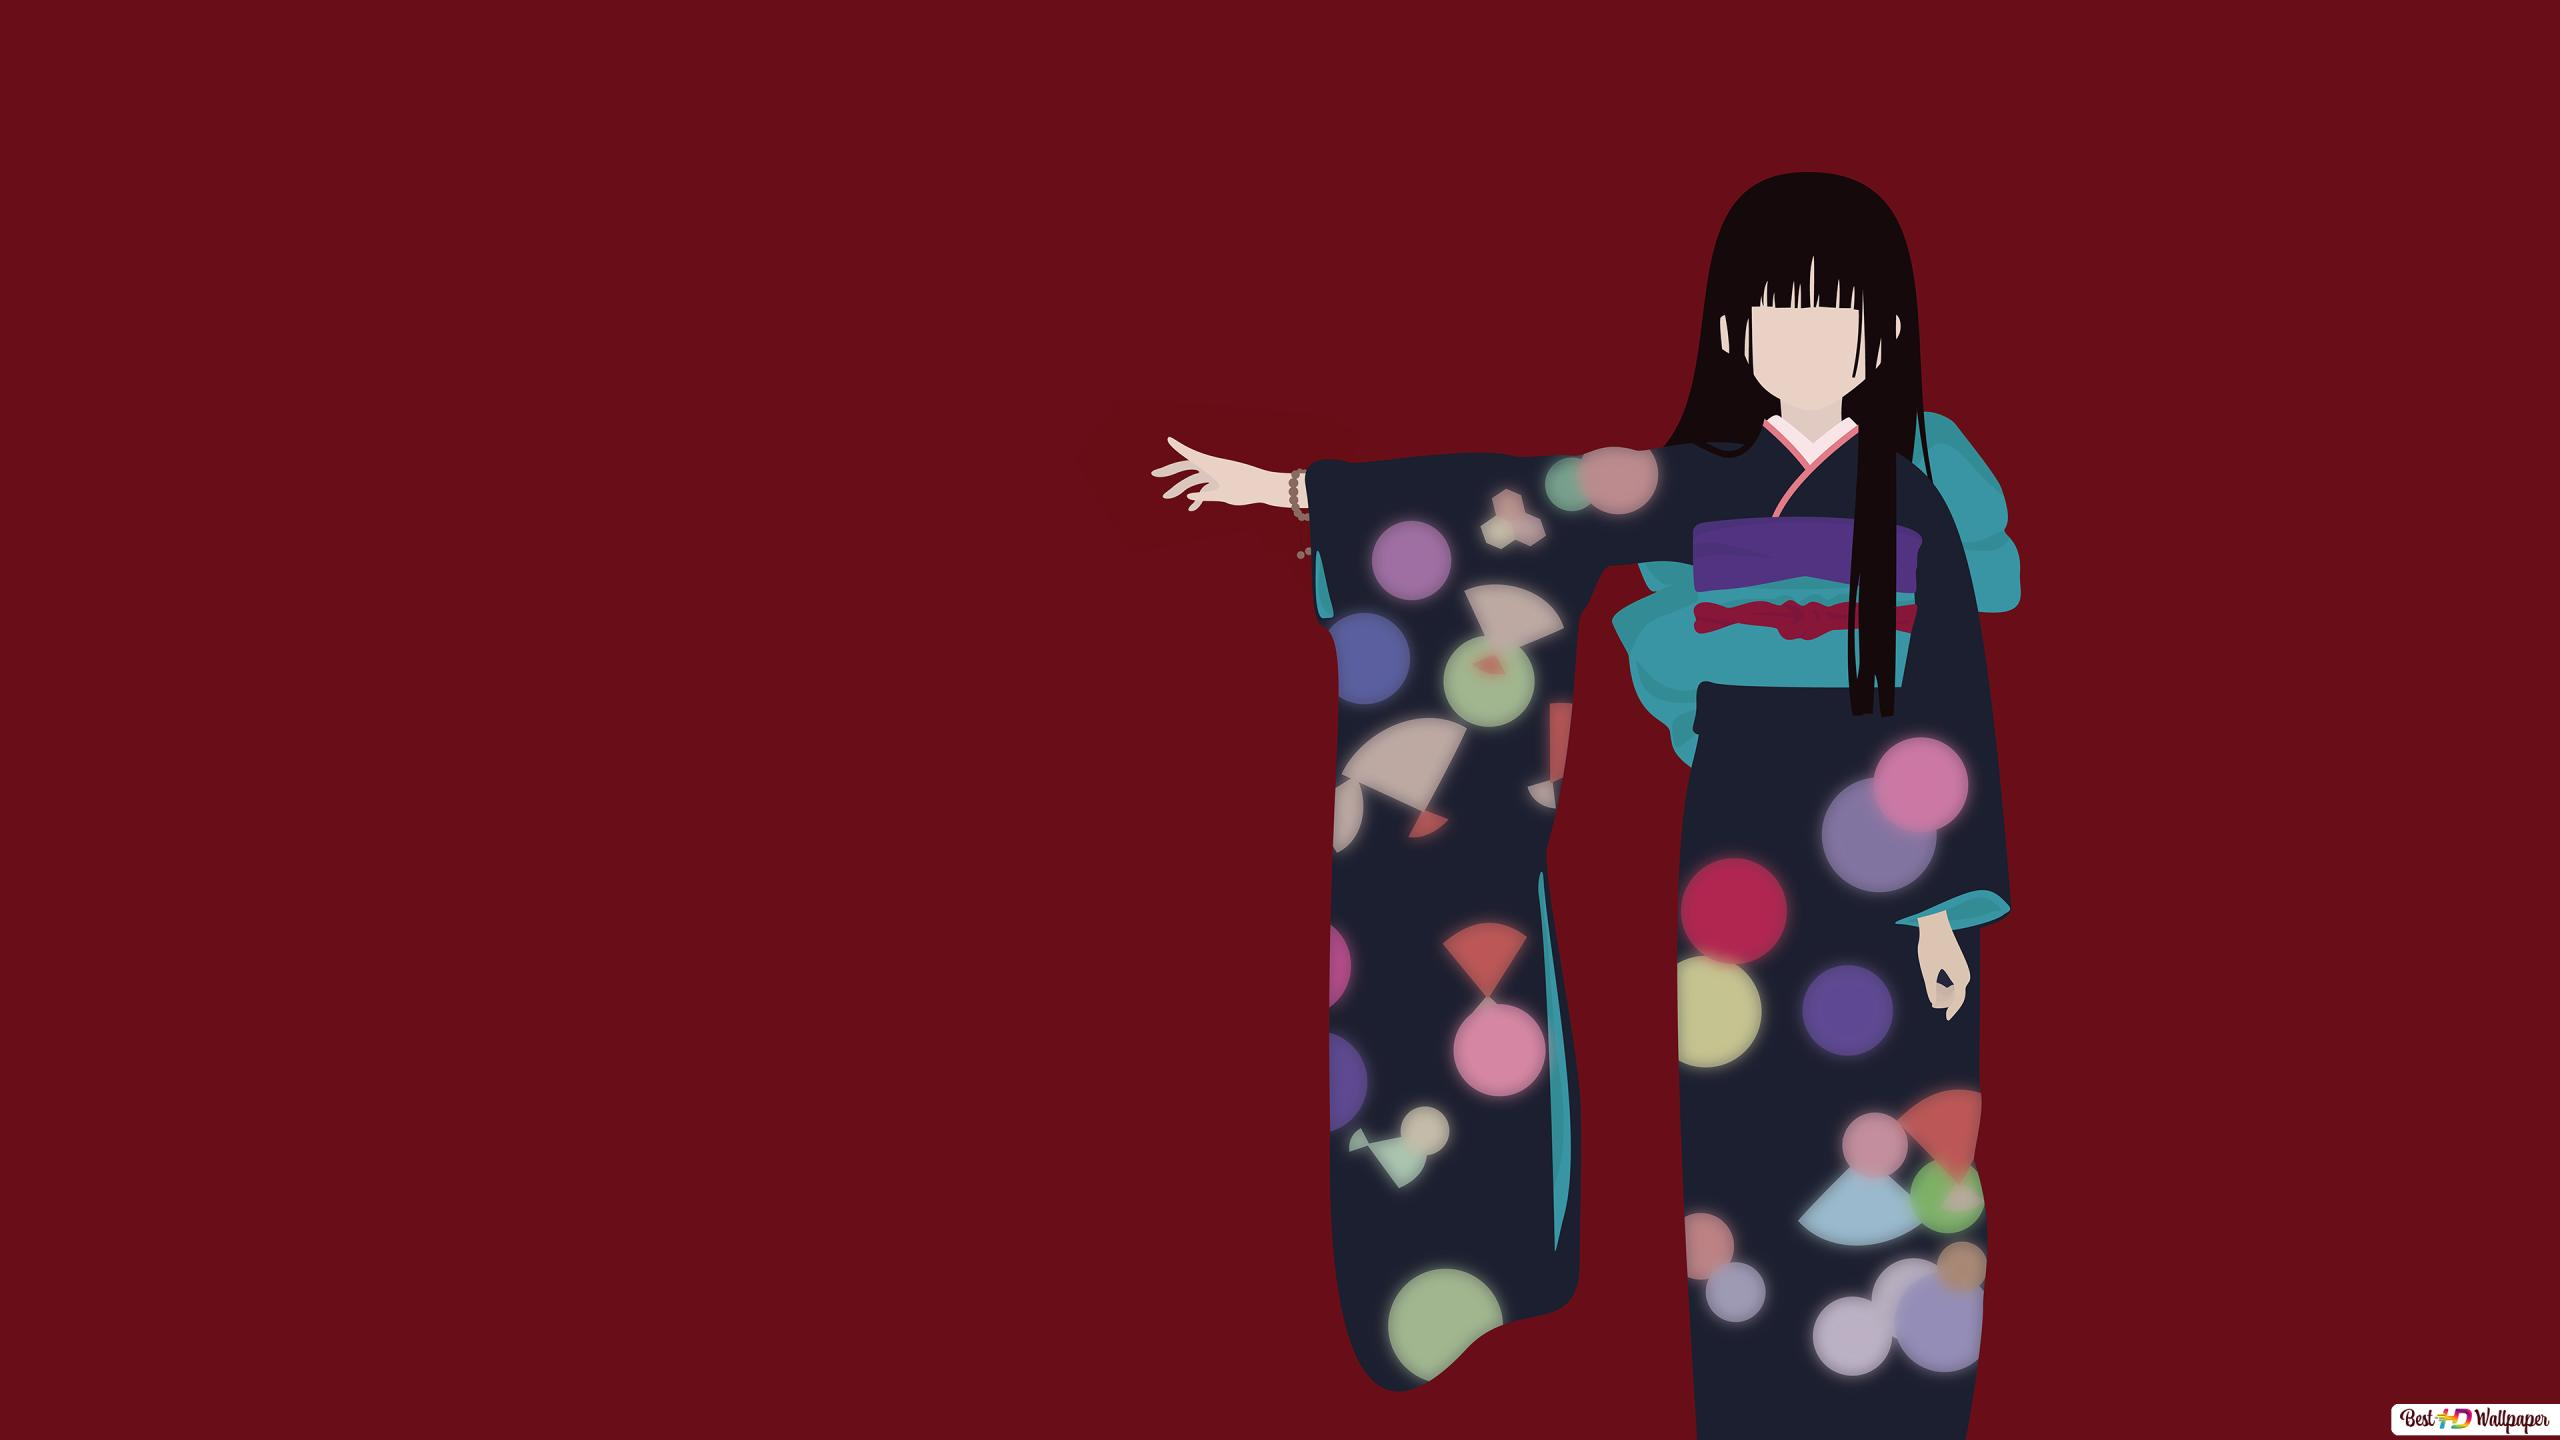 jigukoの少女 黒の着物で閻魔あい hd壁紙のダウンロード